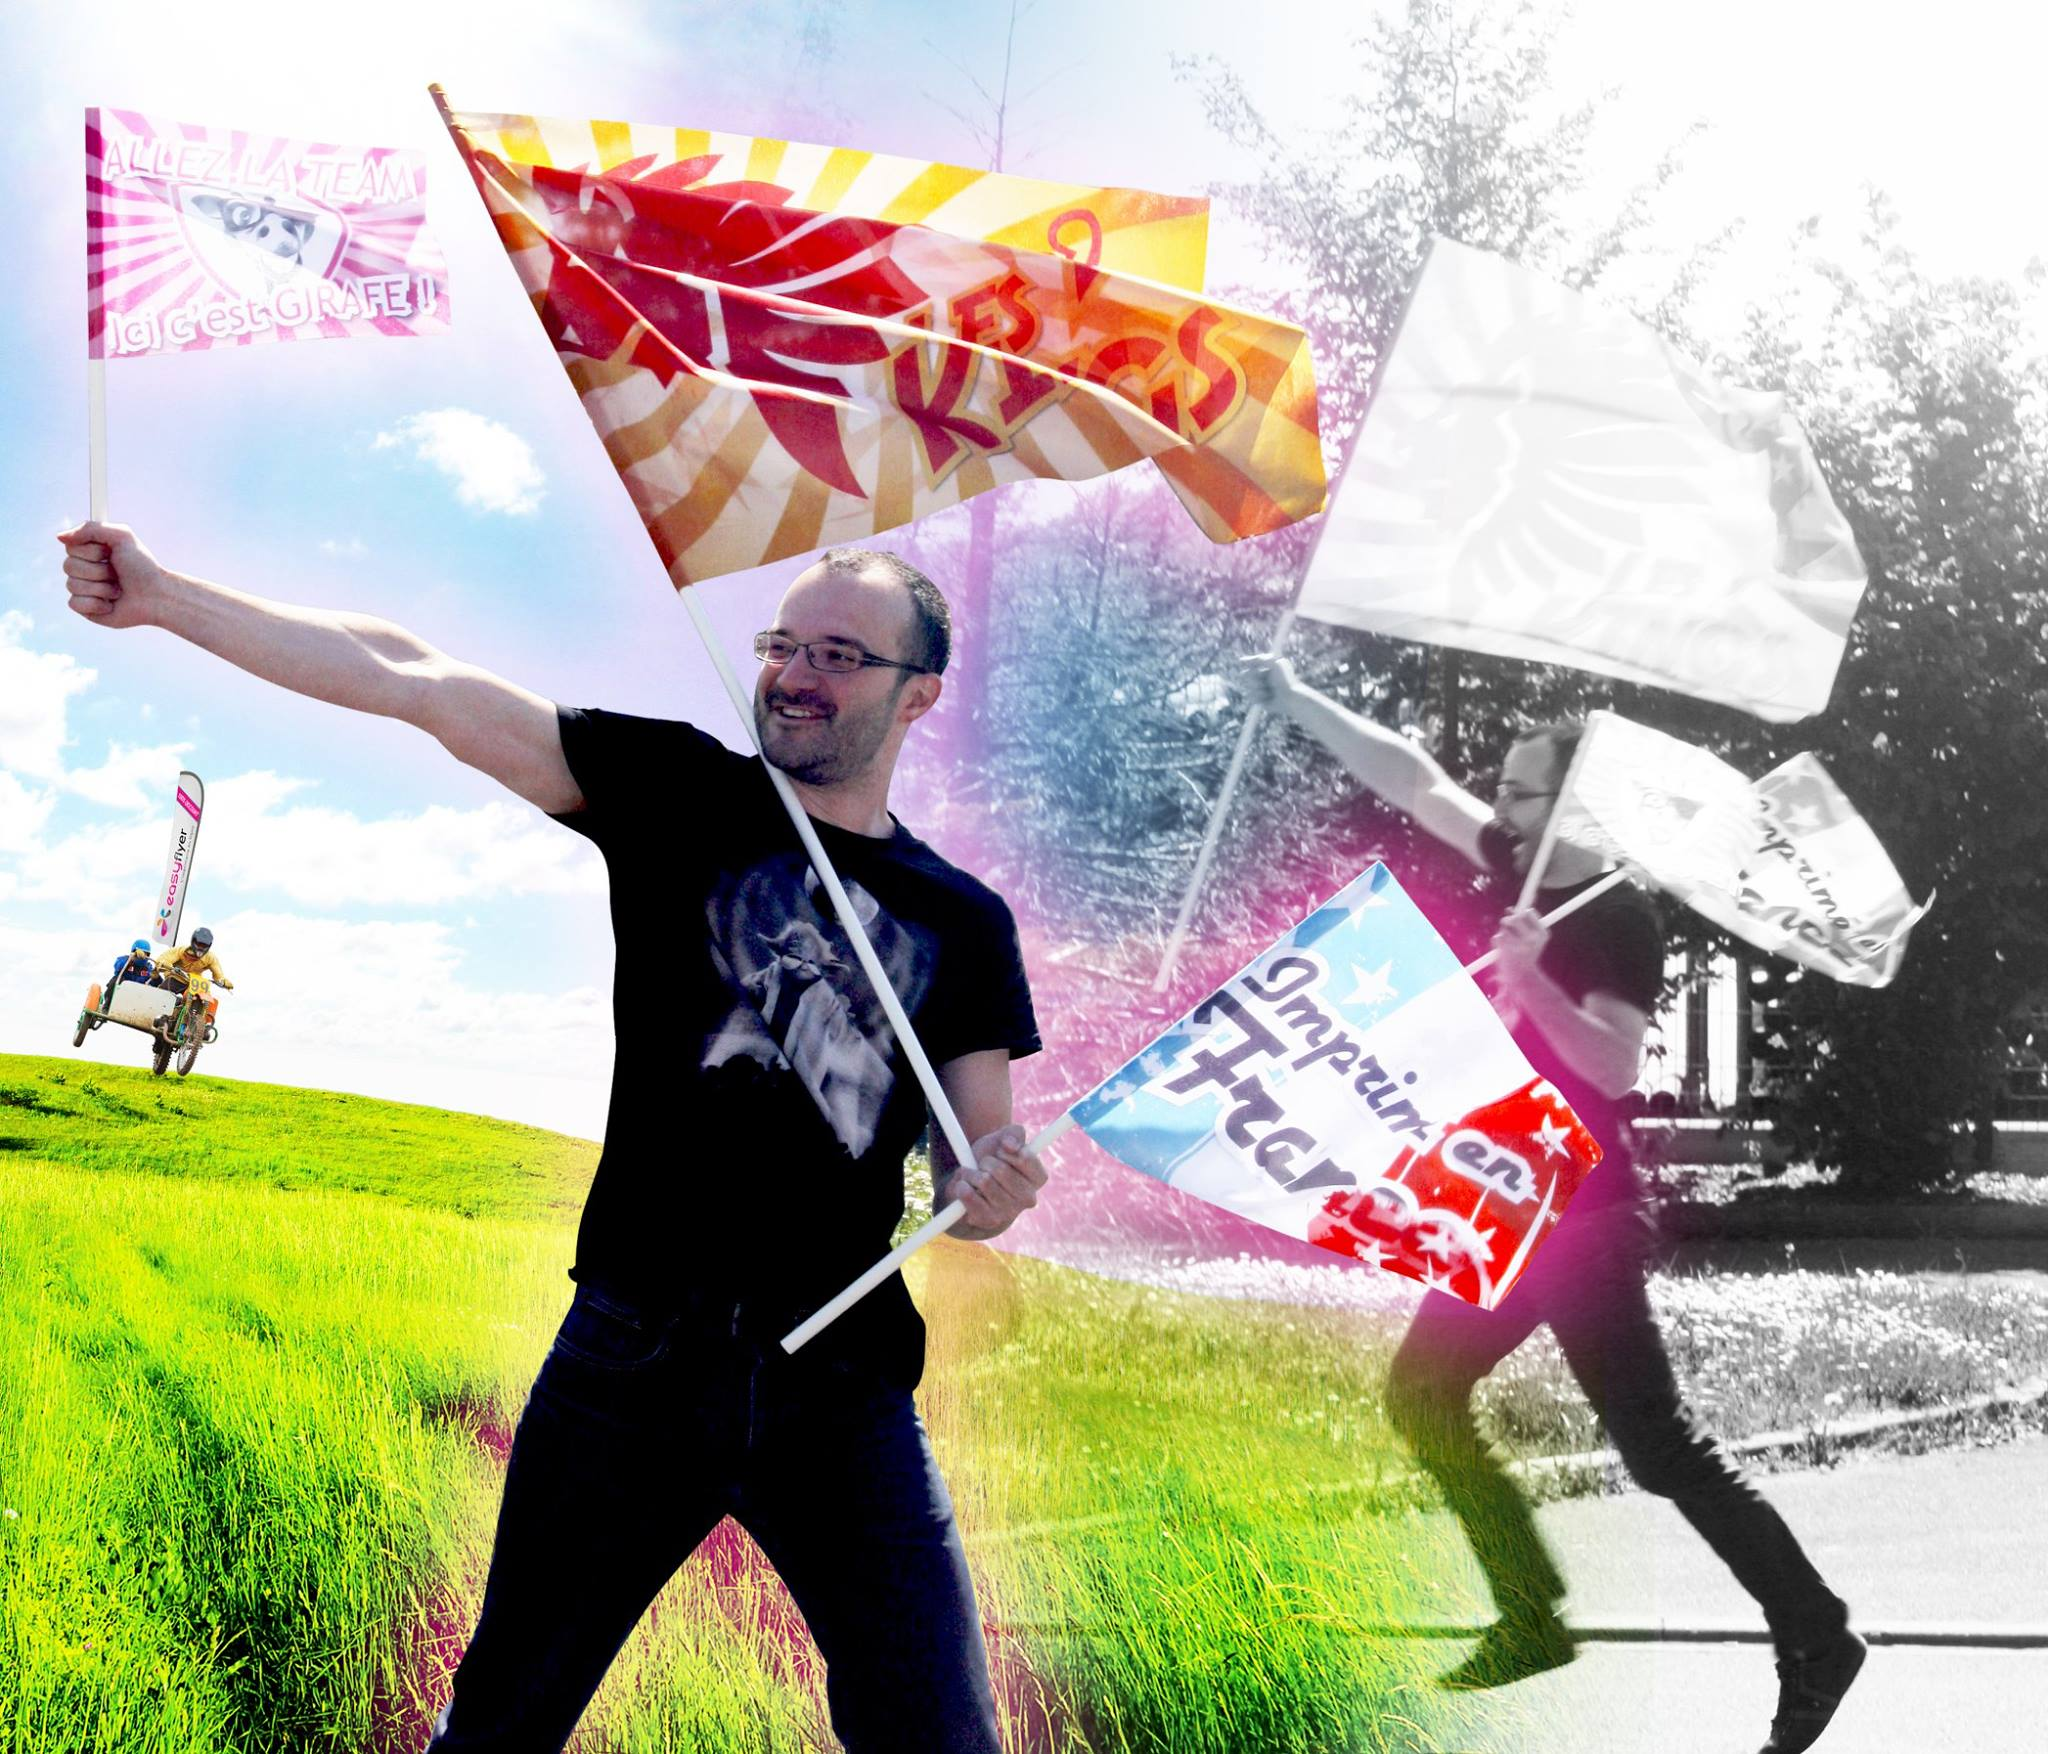 Impression-fanion-drapeau-supporter-personnalise